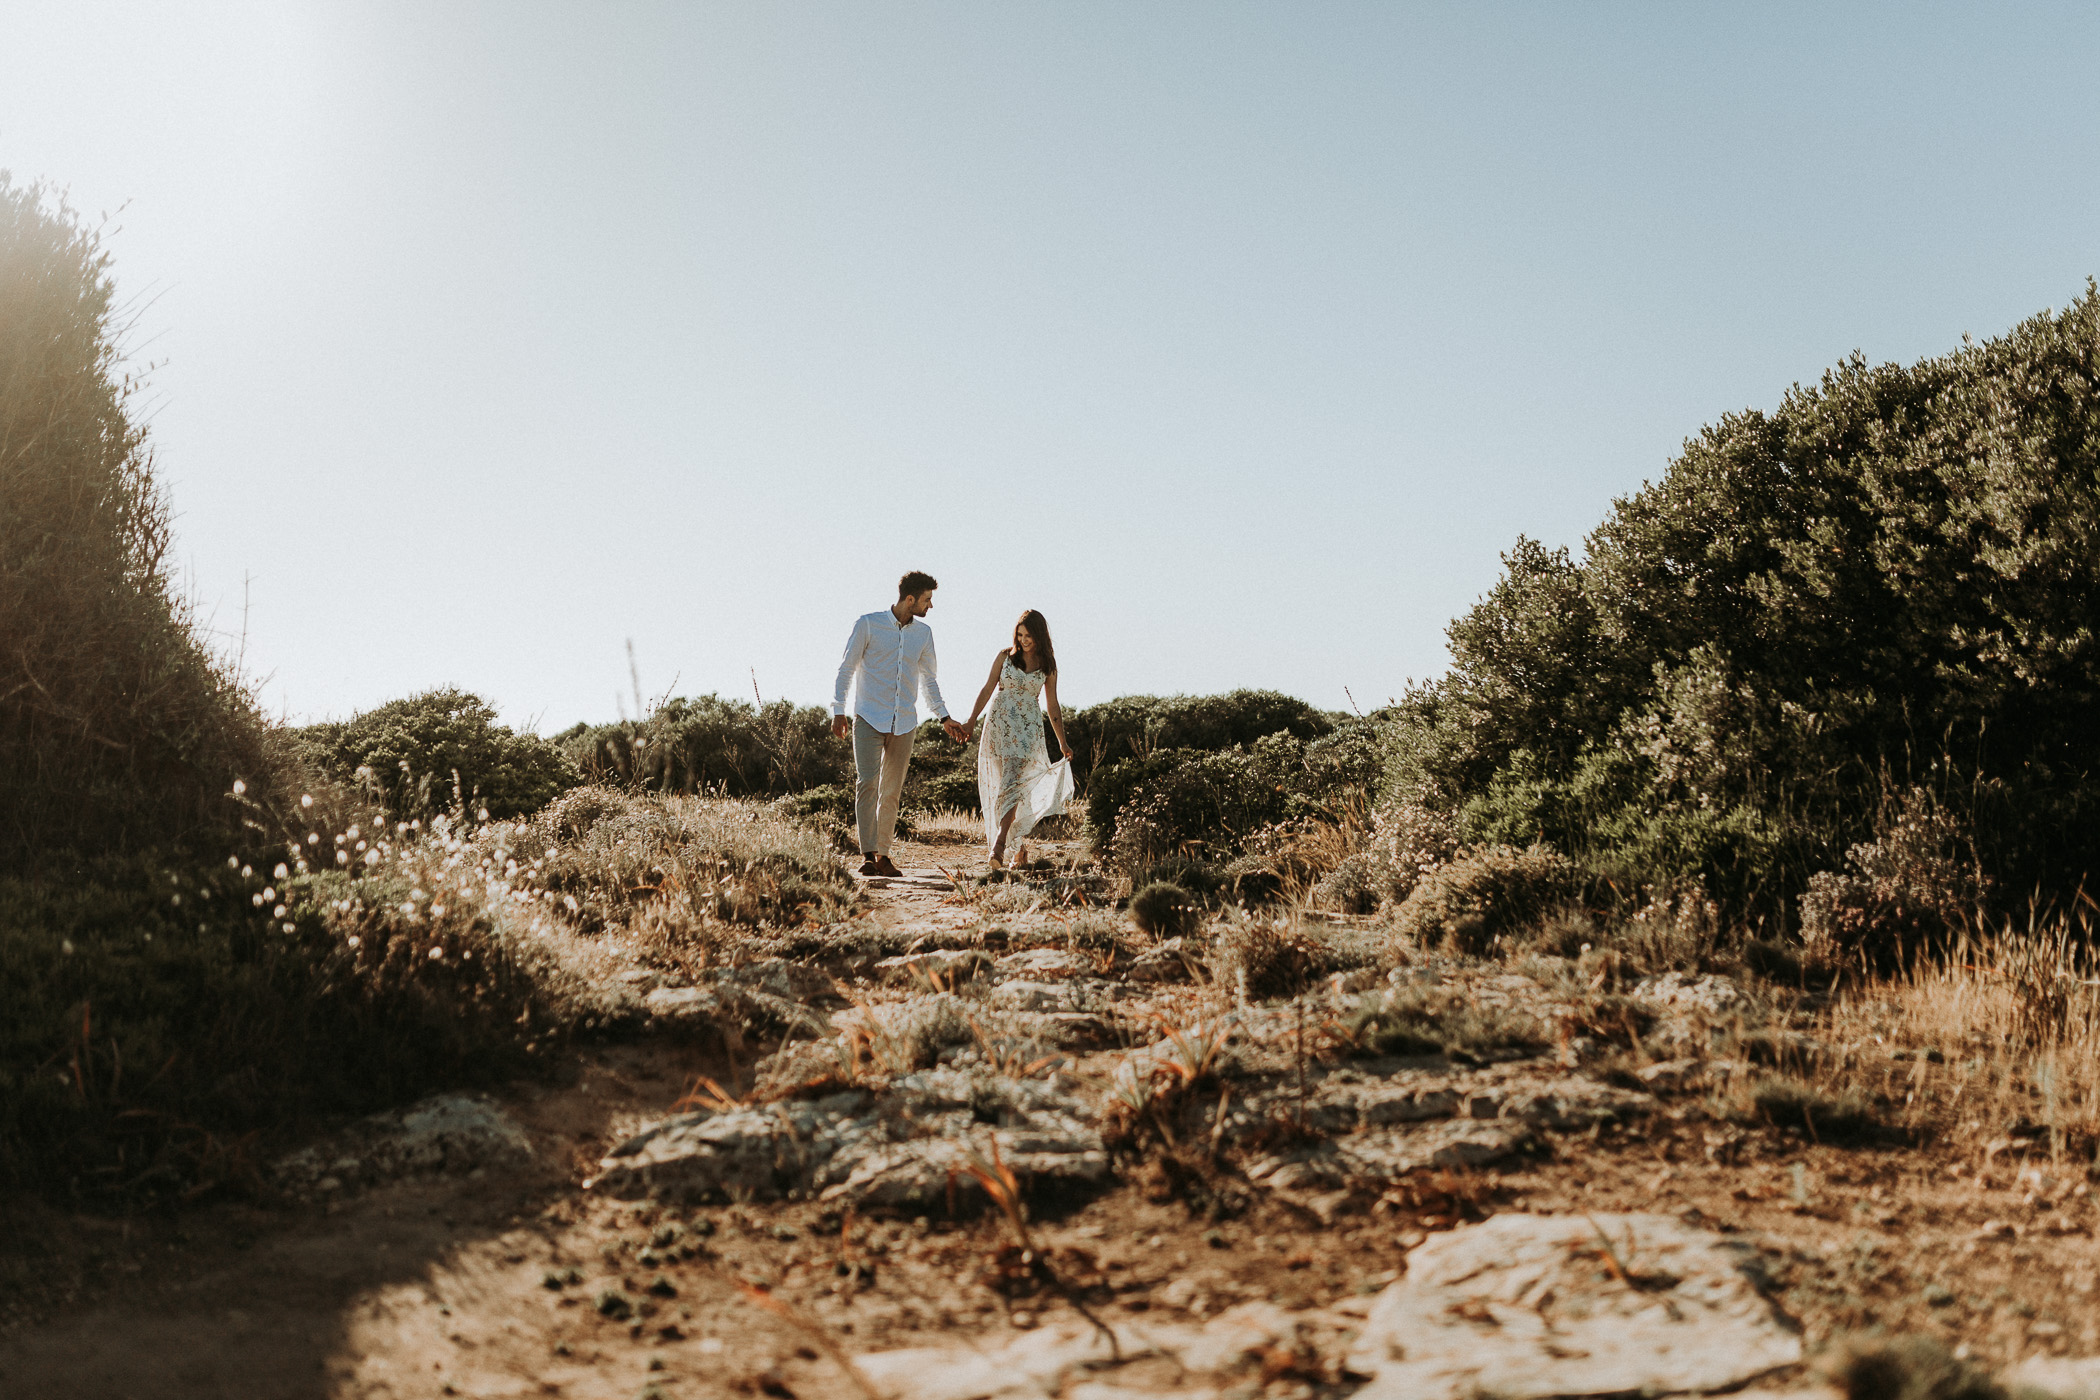 DanielaMarquardtPhotography_wedding_elopement_mallorca_spain_calapi_palma_lauraandtoni_234